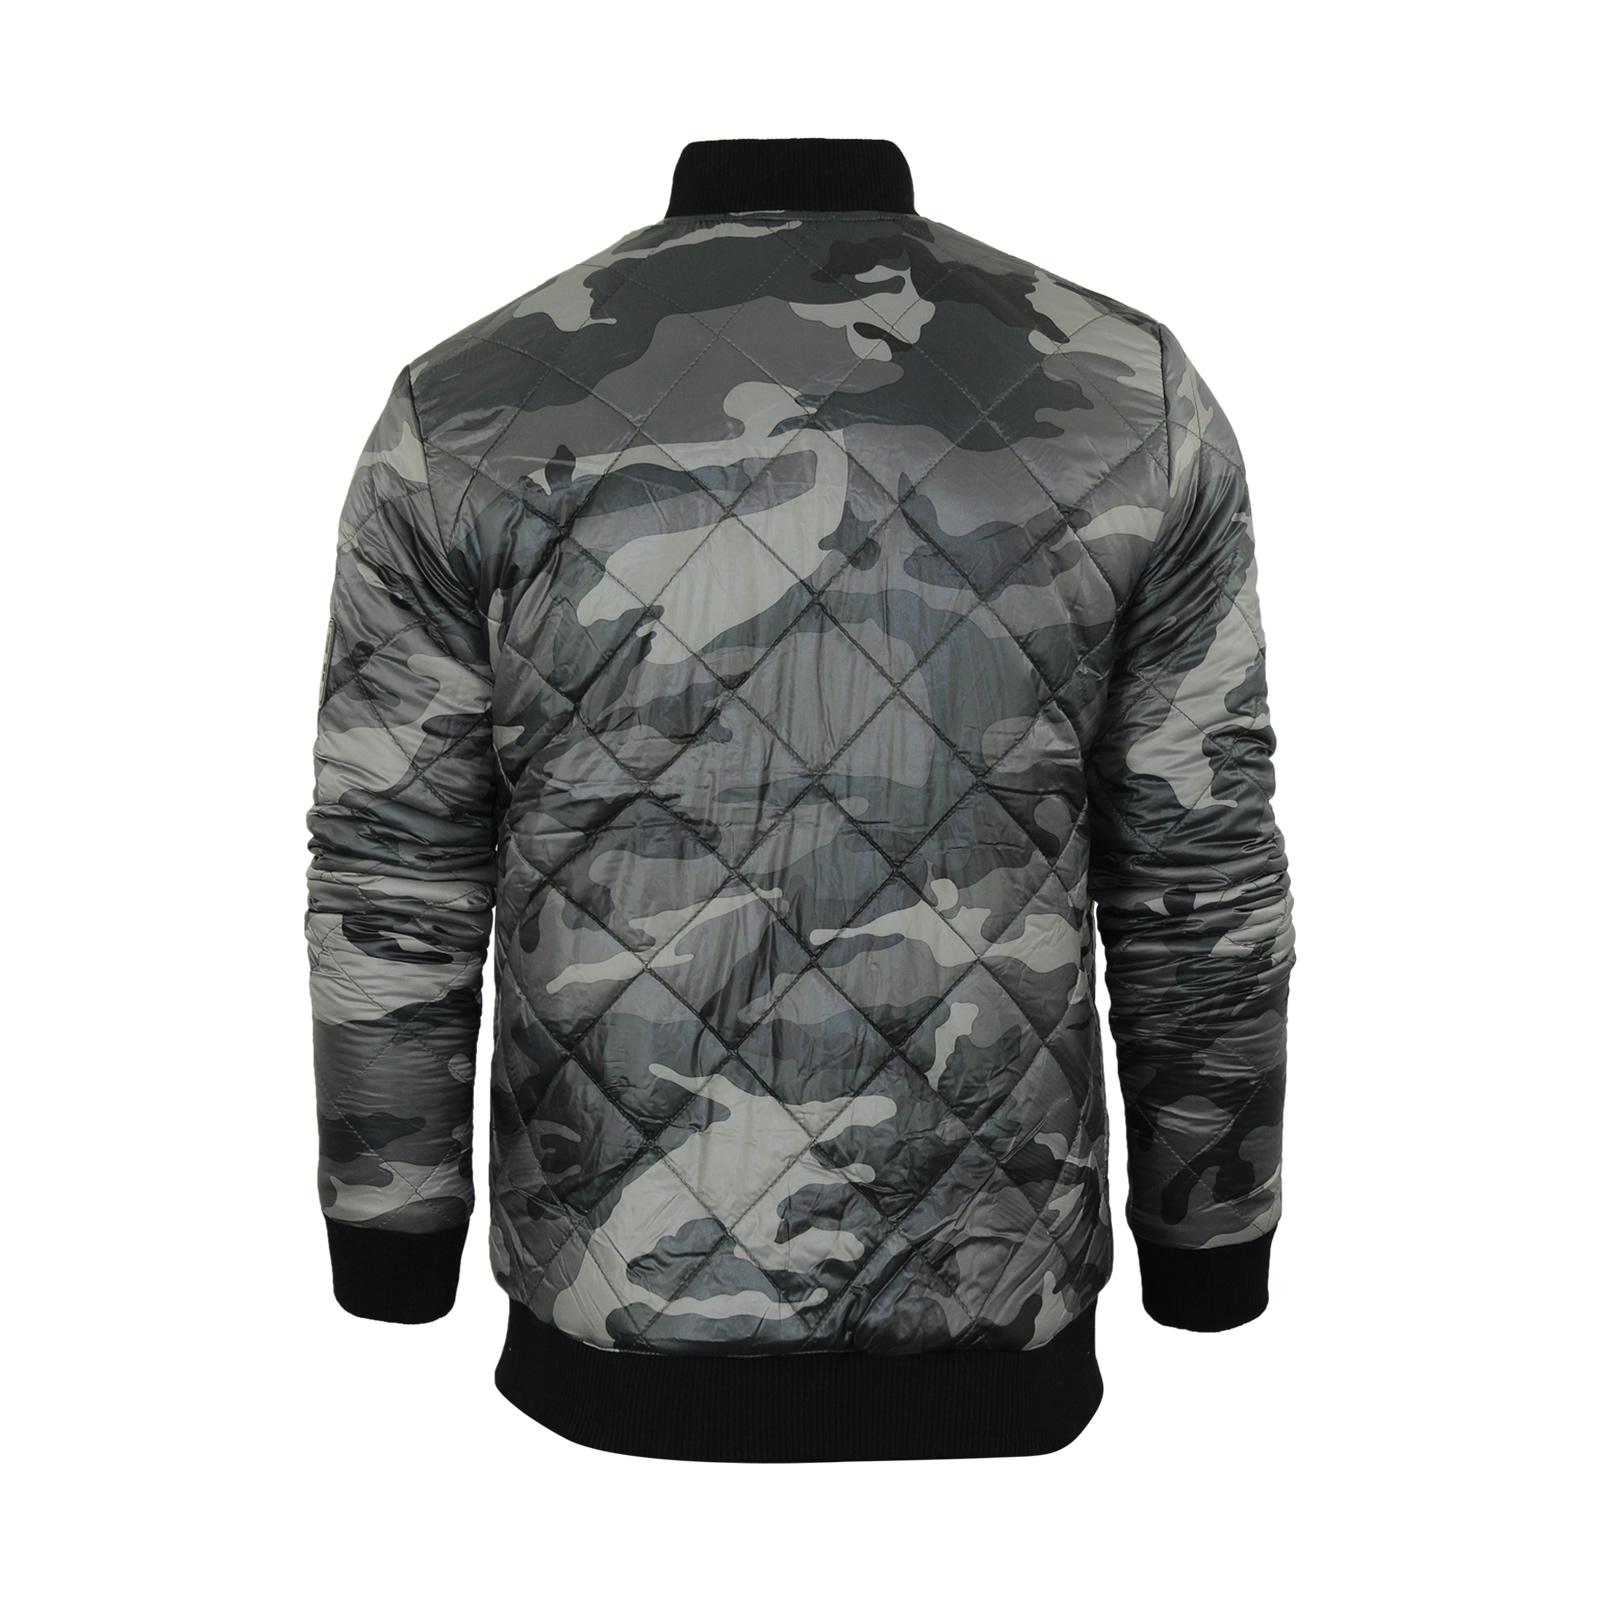 miniature 6 - Veste-homme-smith-amp-jones-roman-camouflage-militaire-MA1-bomber-harrington-manteau